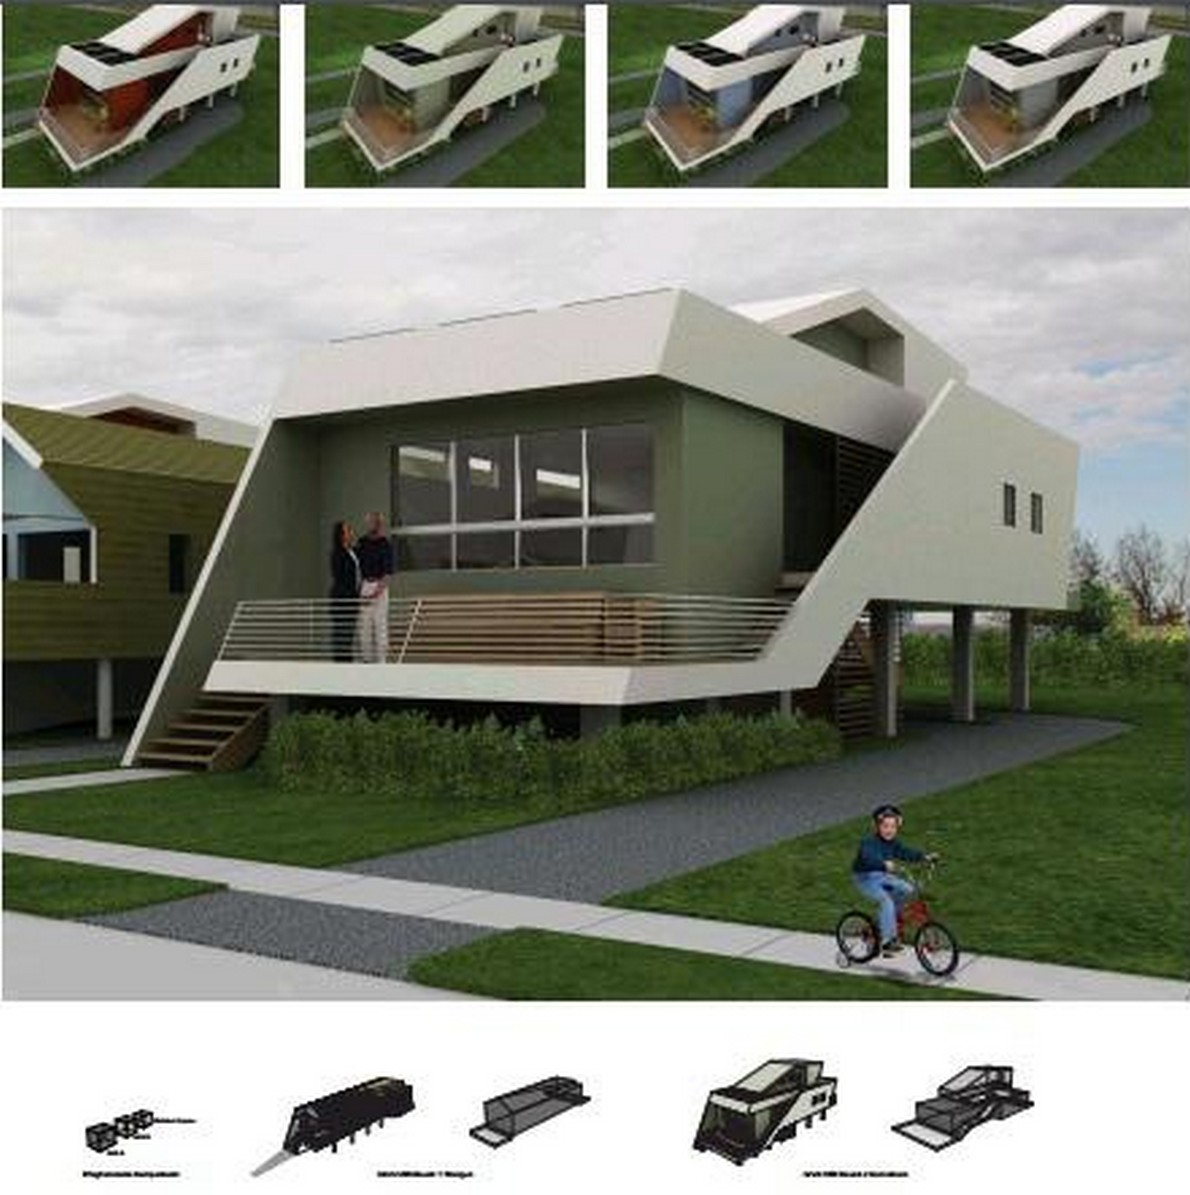 Modelli di case da costruire finest miniatura di una casa for Modelli di case da costruire